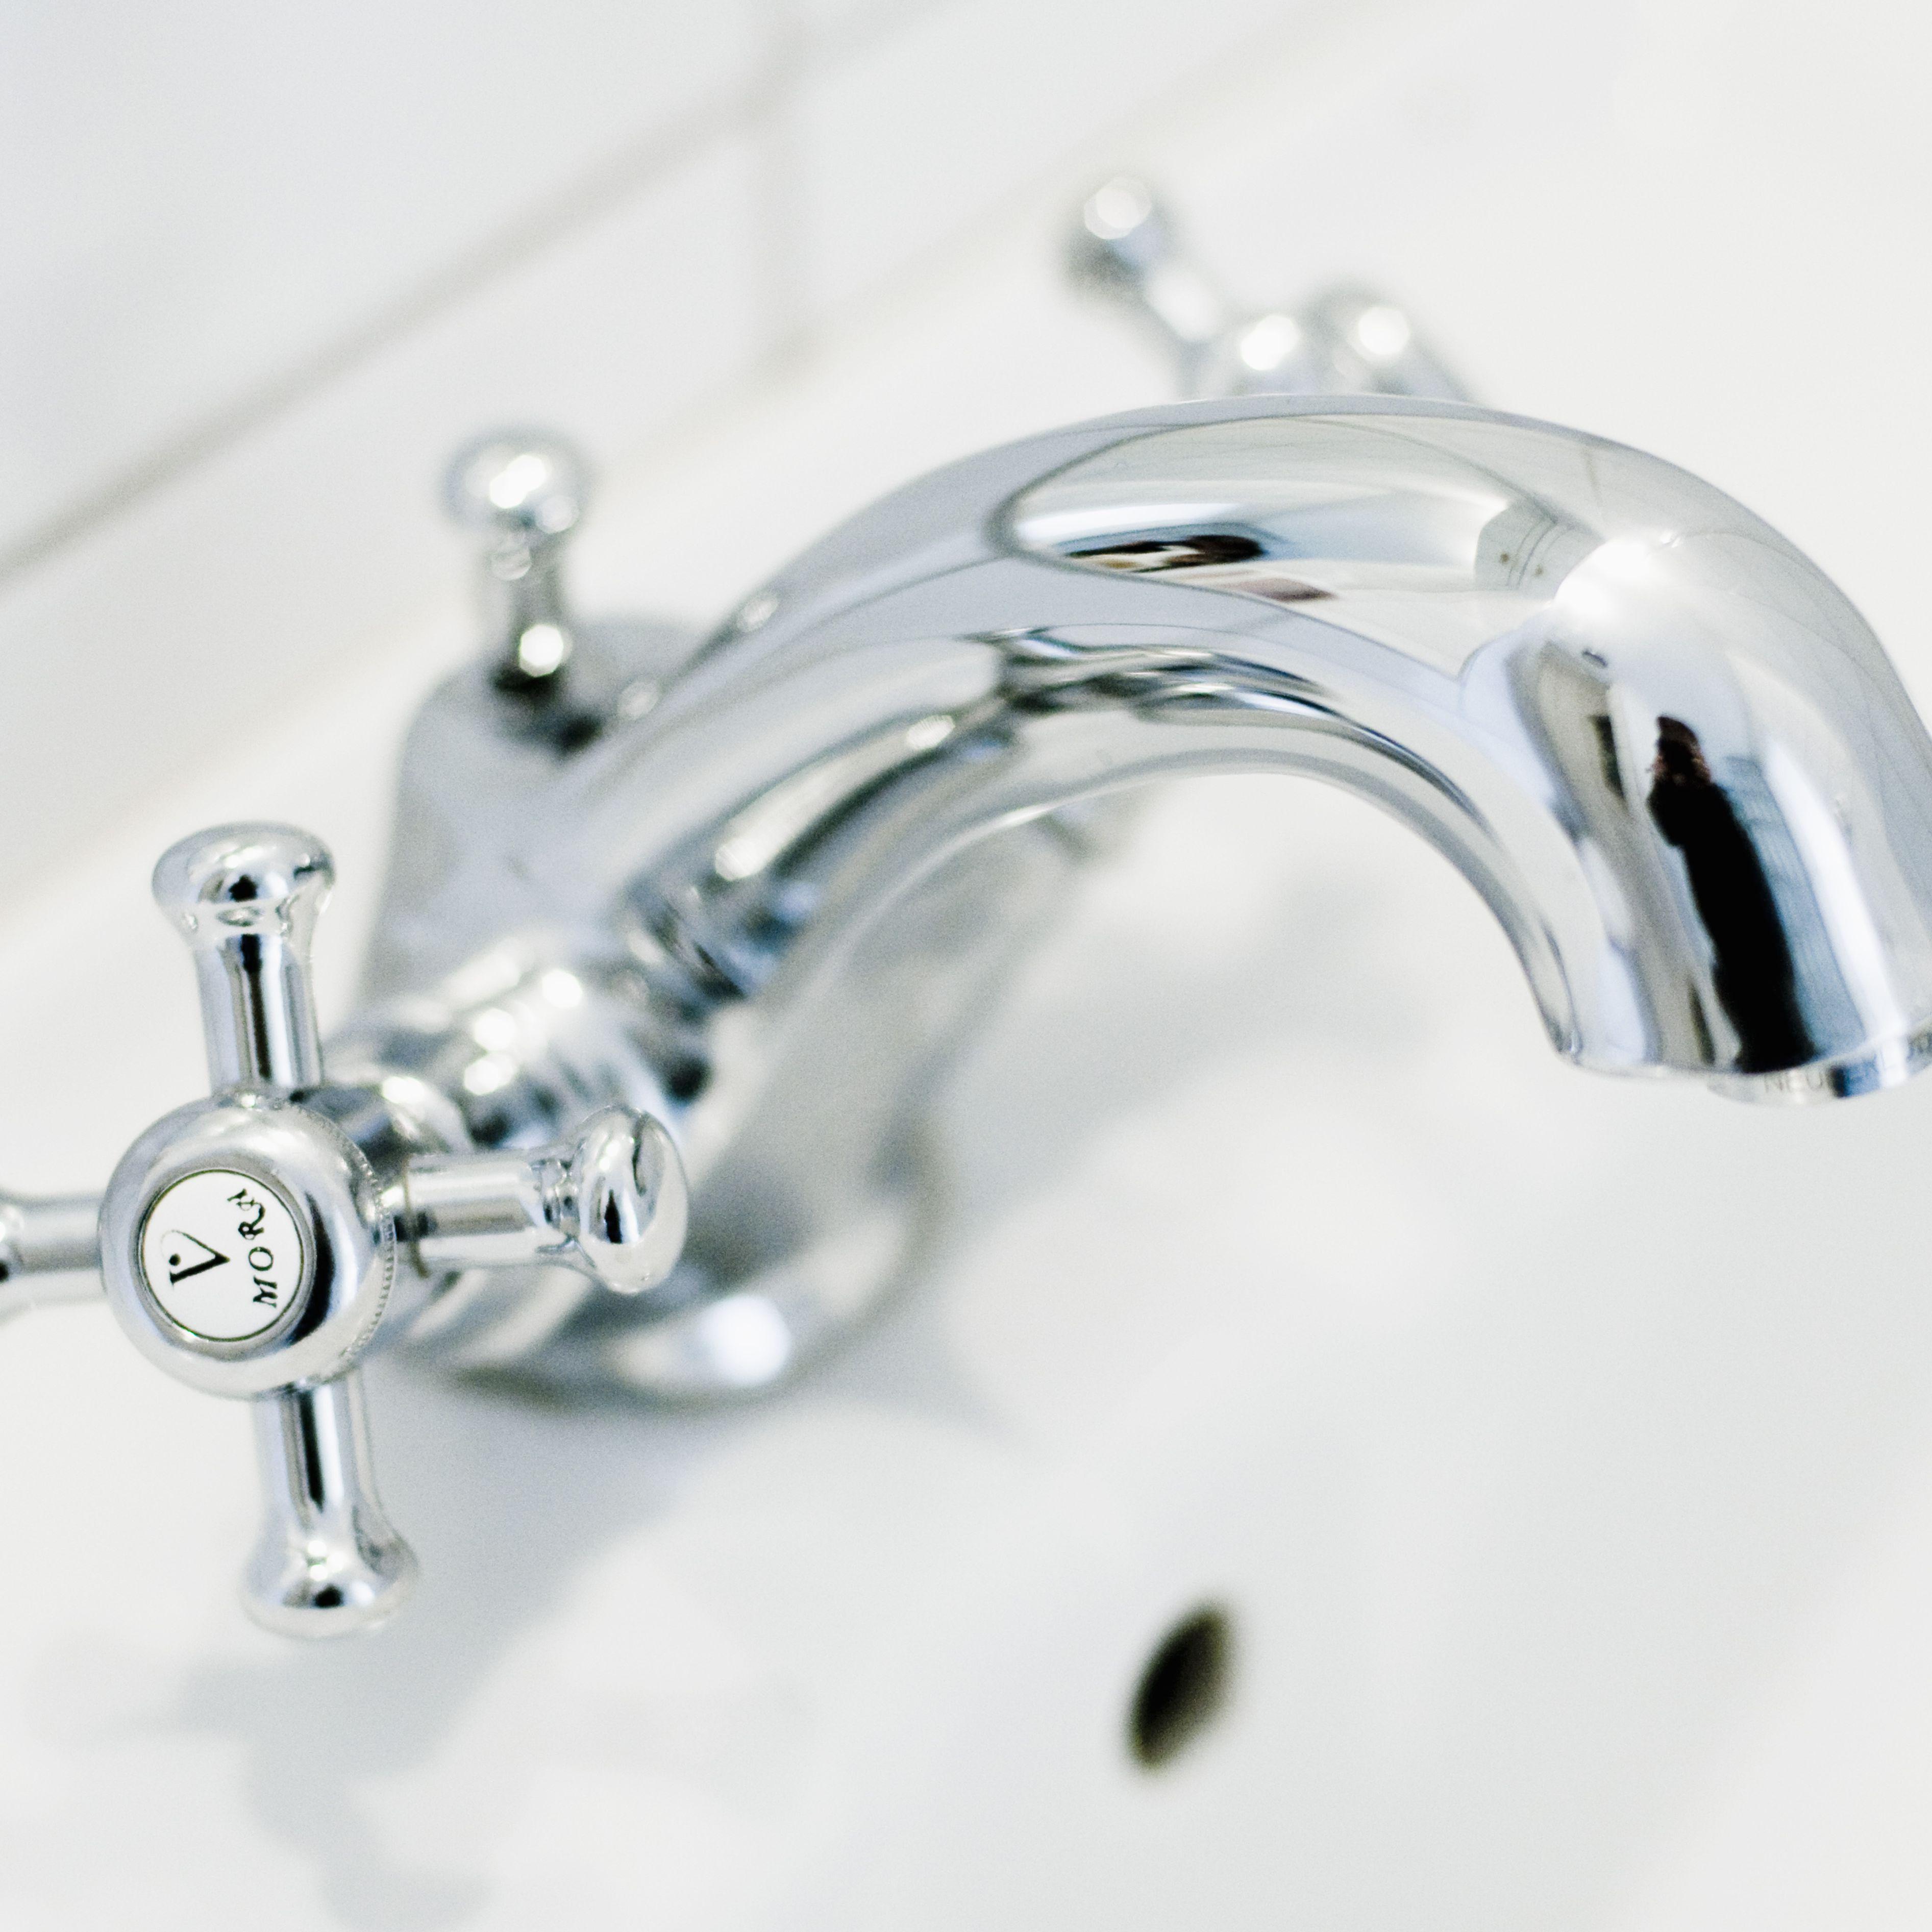 replace a mobile home bathtub faucet